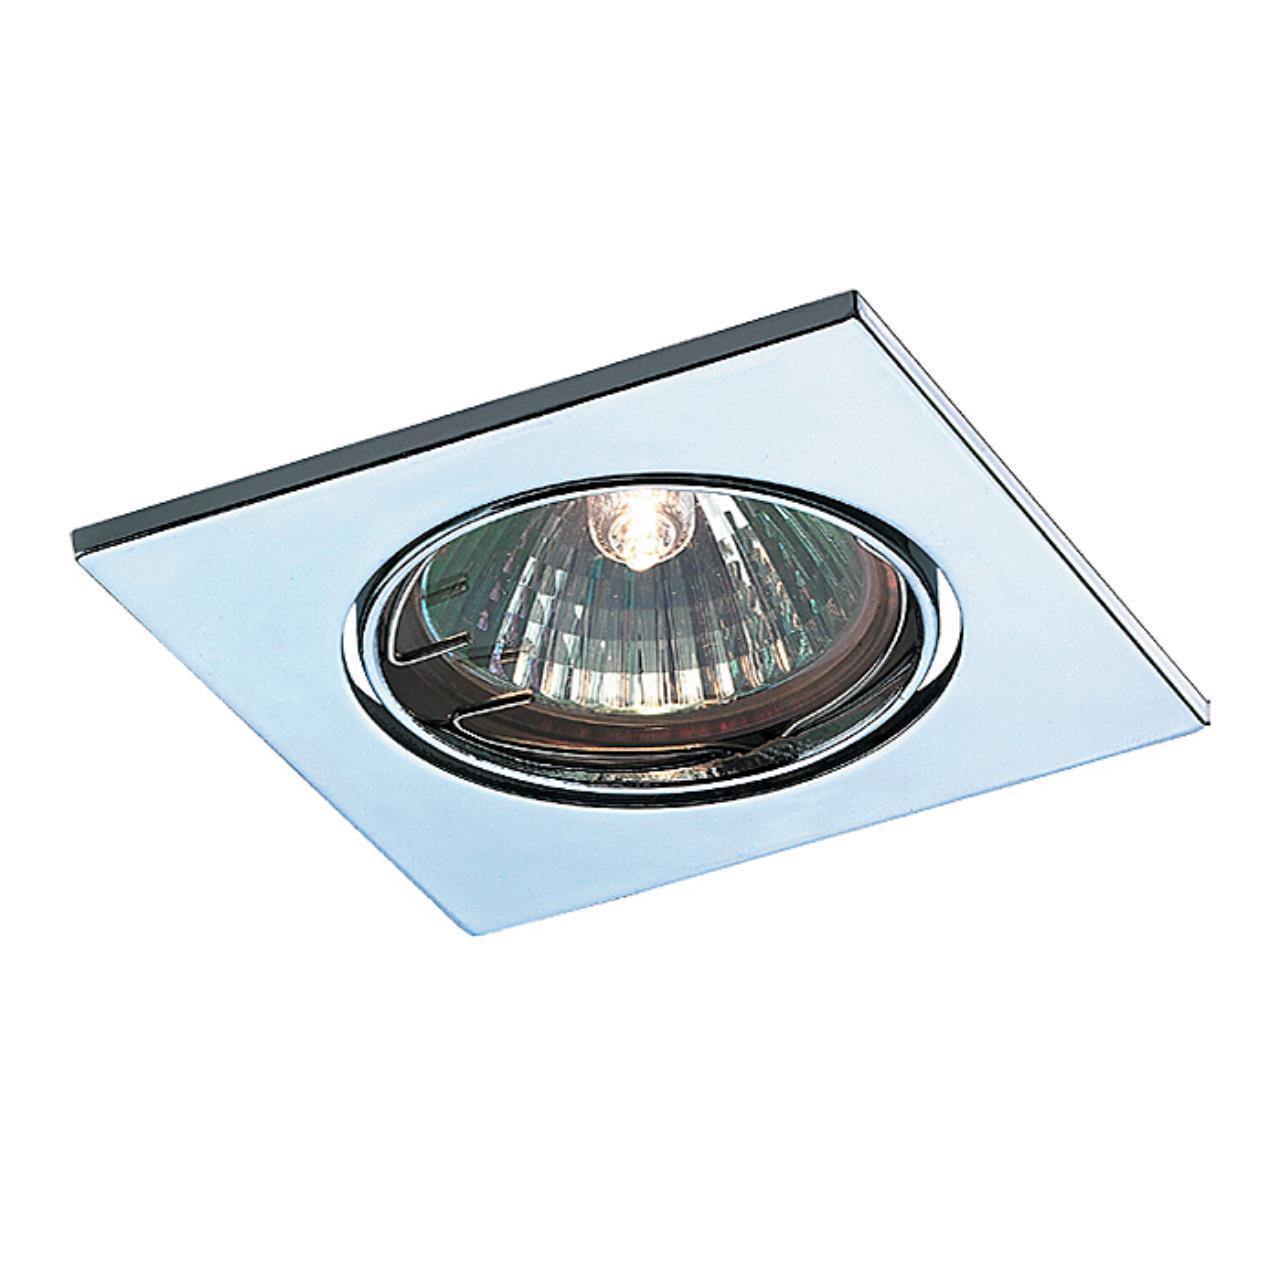 369347 SPOT NT09 131 хром Встраиваемый НП светильник IP20 GX5.3 50W 12V QUADRO